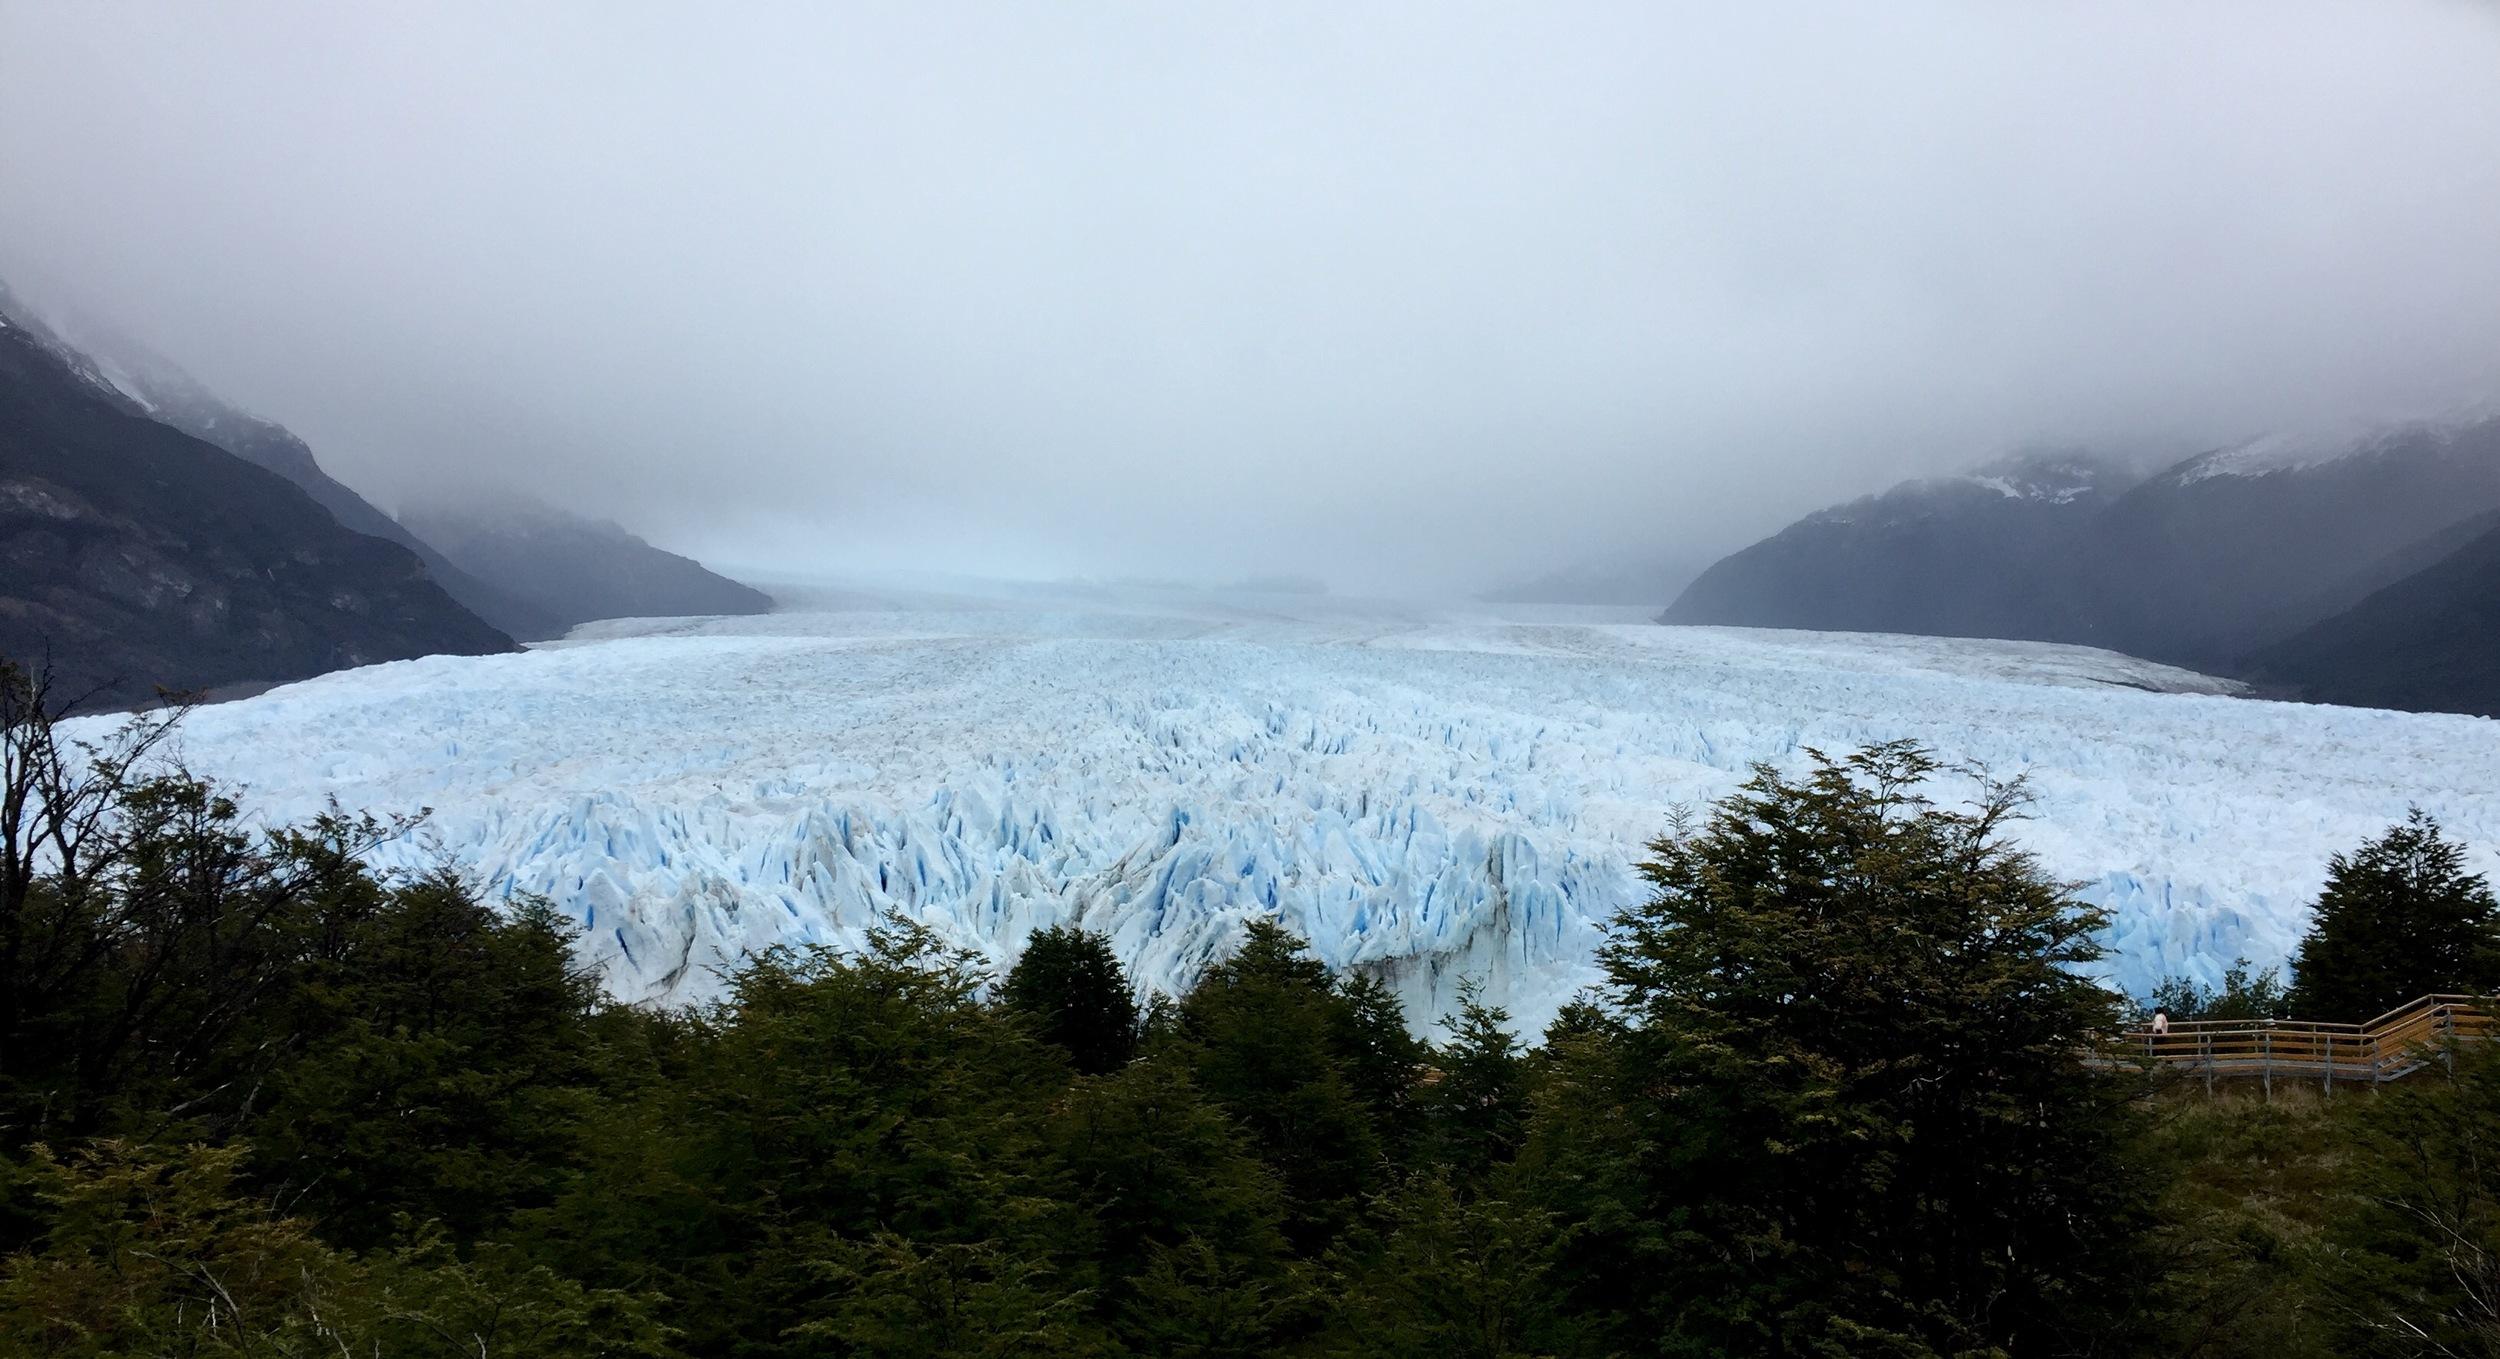 Perito Moreno Glacier, part of Los Glaciares National Park, is one of South America's most popular tourist attractions.